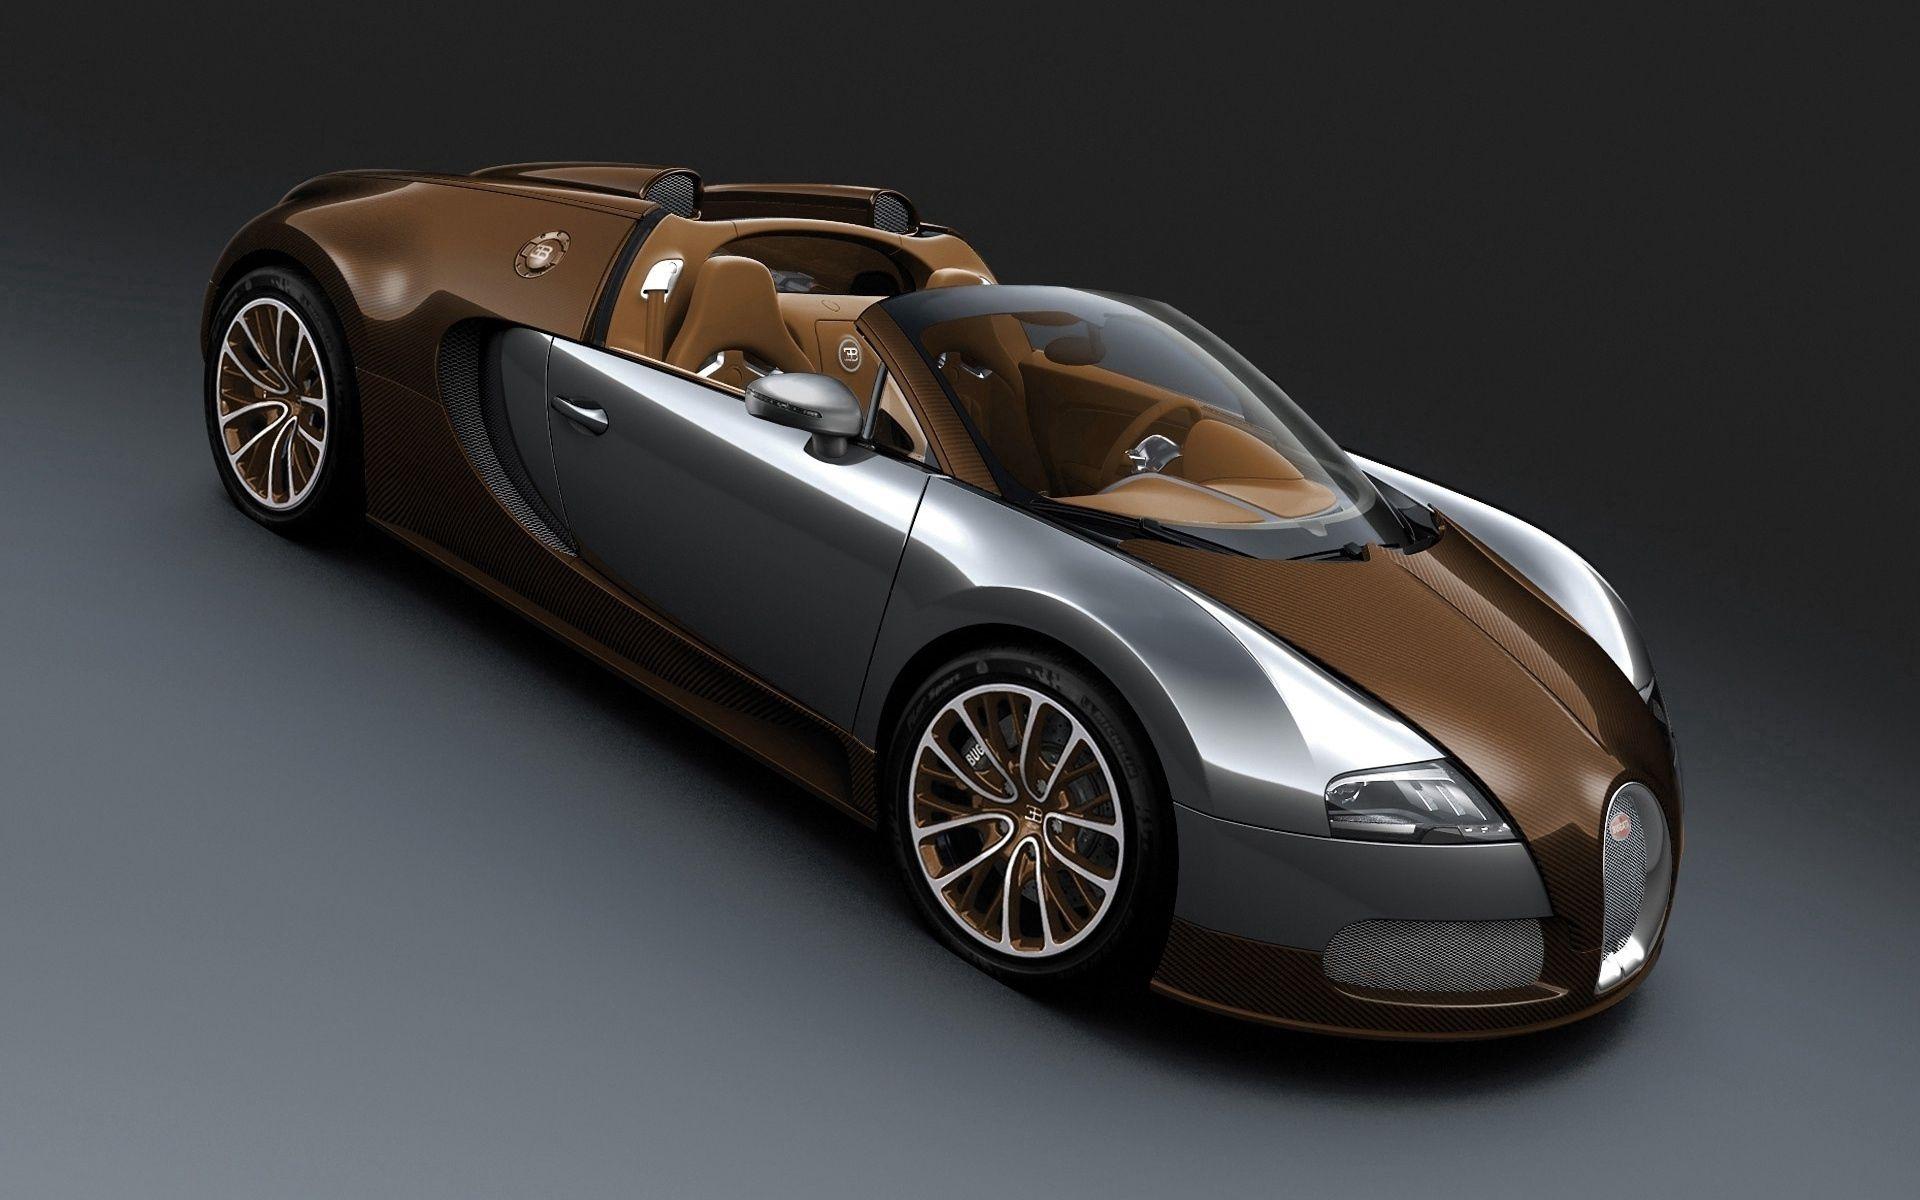 111052 download wallpaper Bugatti, Cars, Bugatti Veyron, Grand Sport screensavers and pictures for free